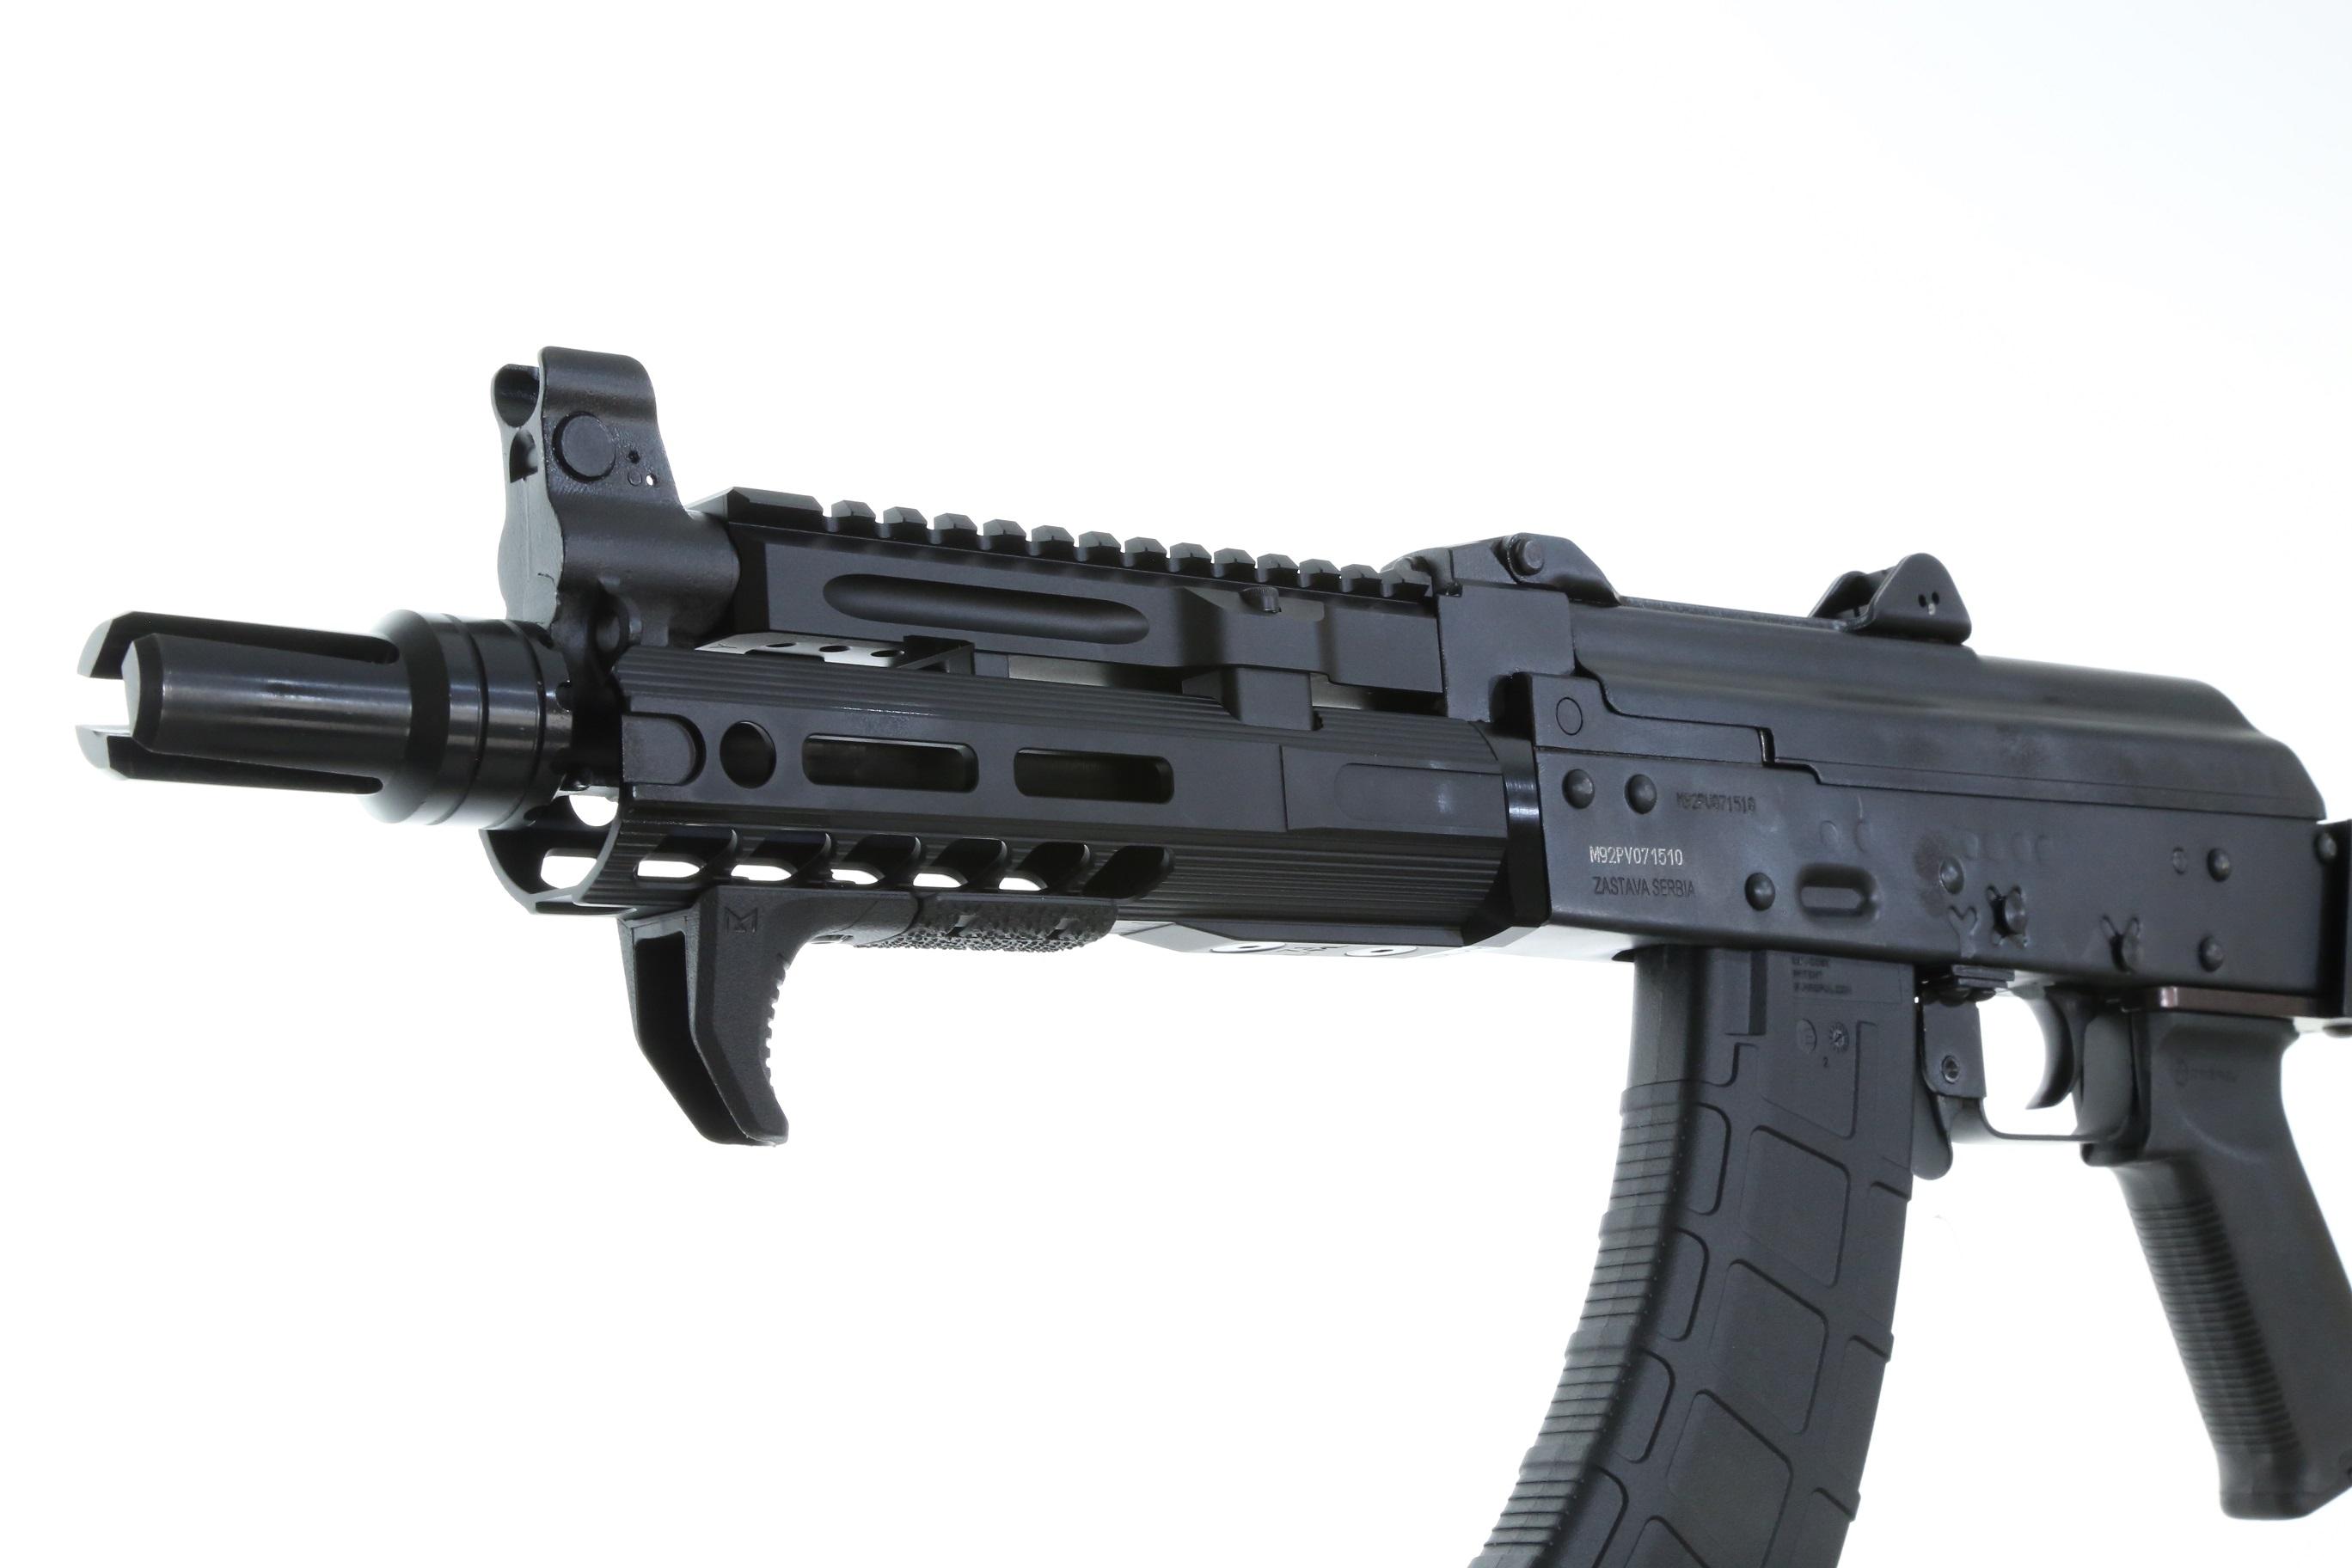 Century Arms ZASTAVA PAP M92 AK Pistol 7 62X39 SLR Rifleworks Handguard and  Railed gas tube Tromix Charging Handle M Lok Handstop MOE Plus AK Grip